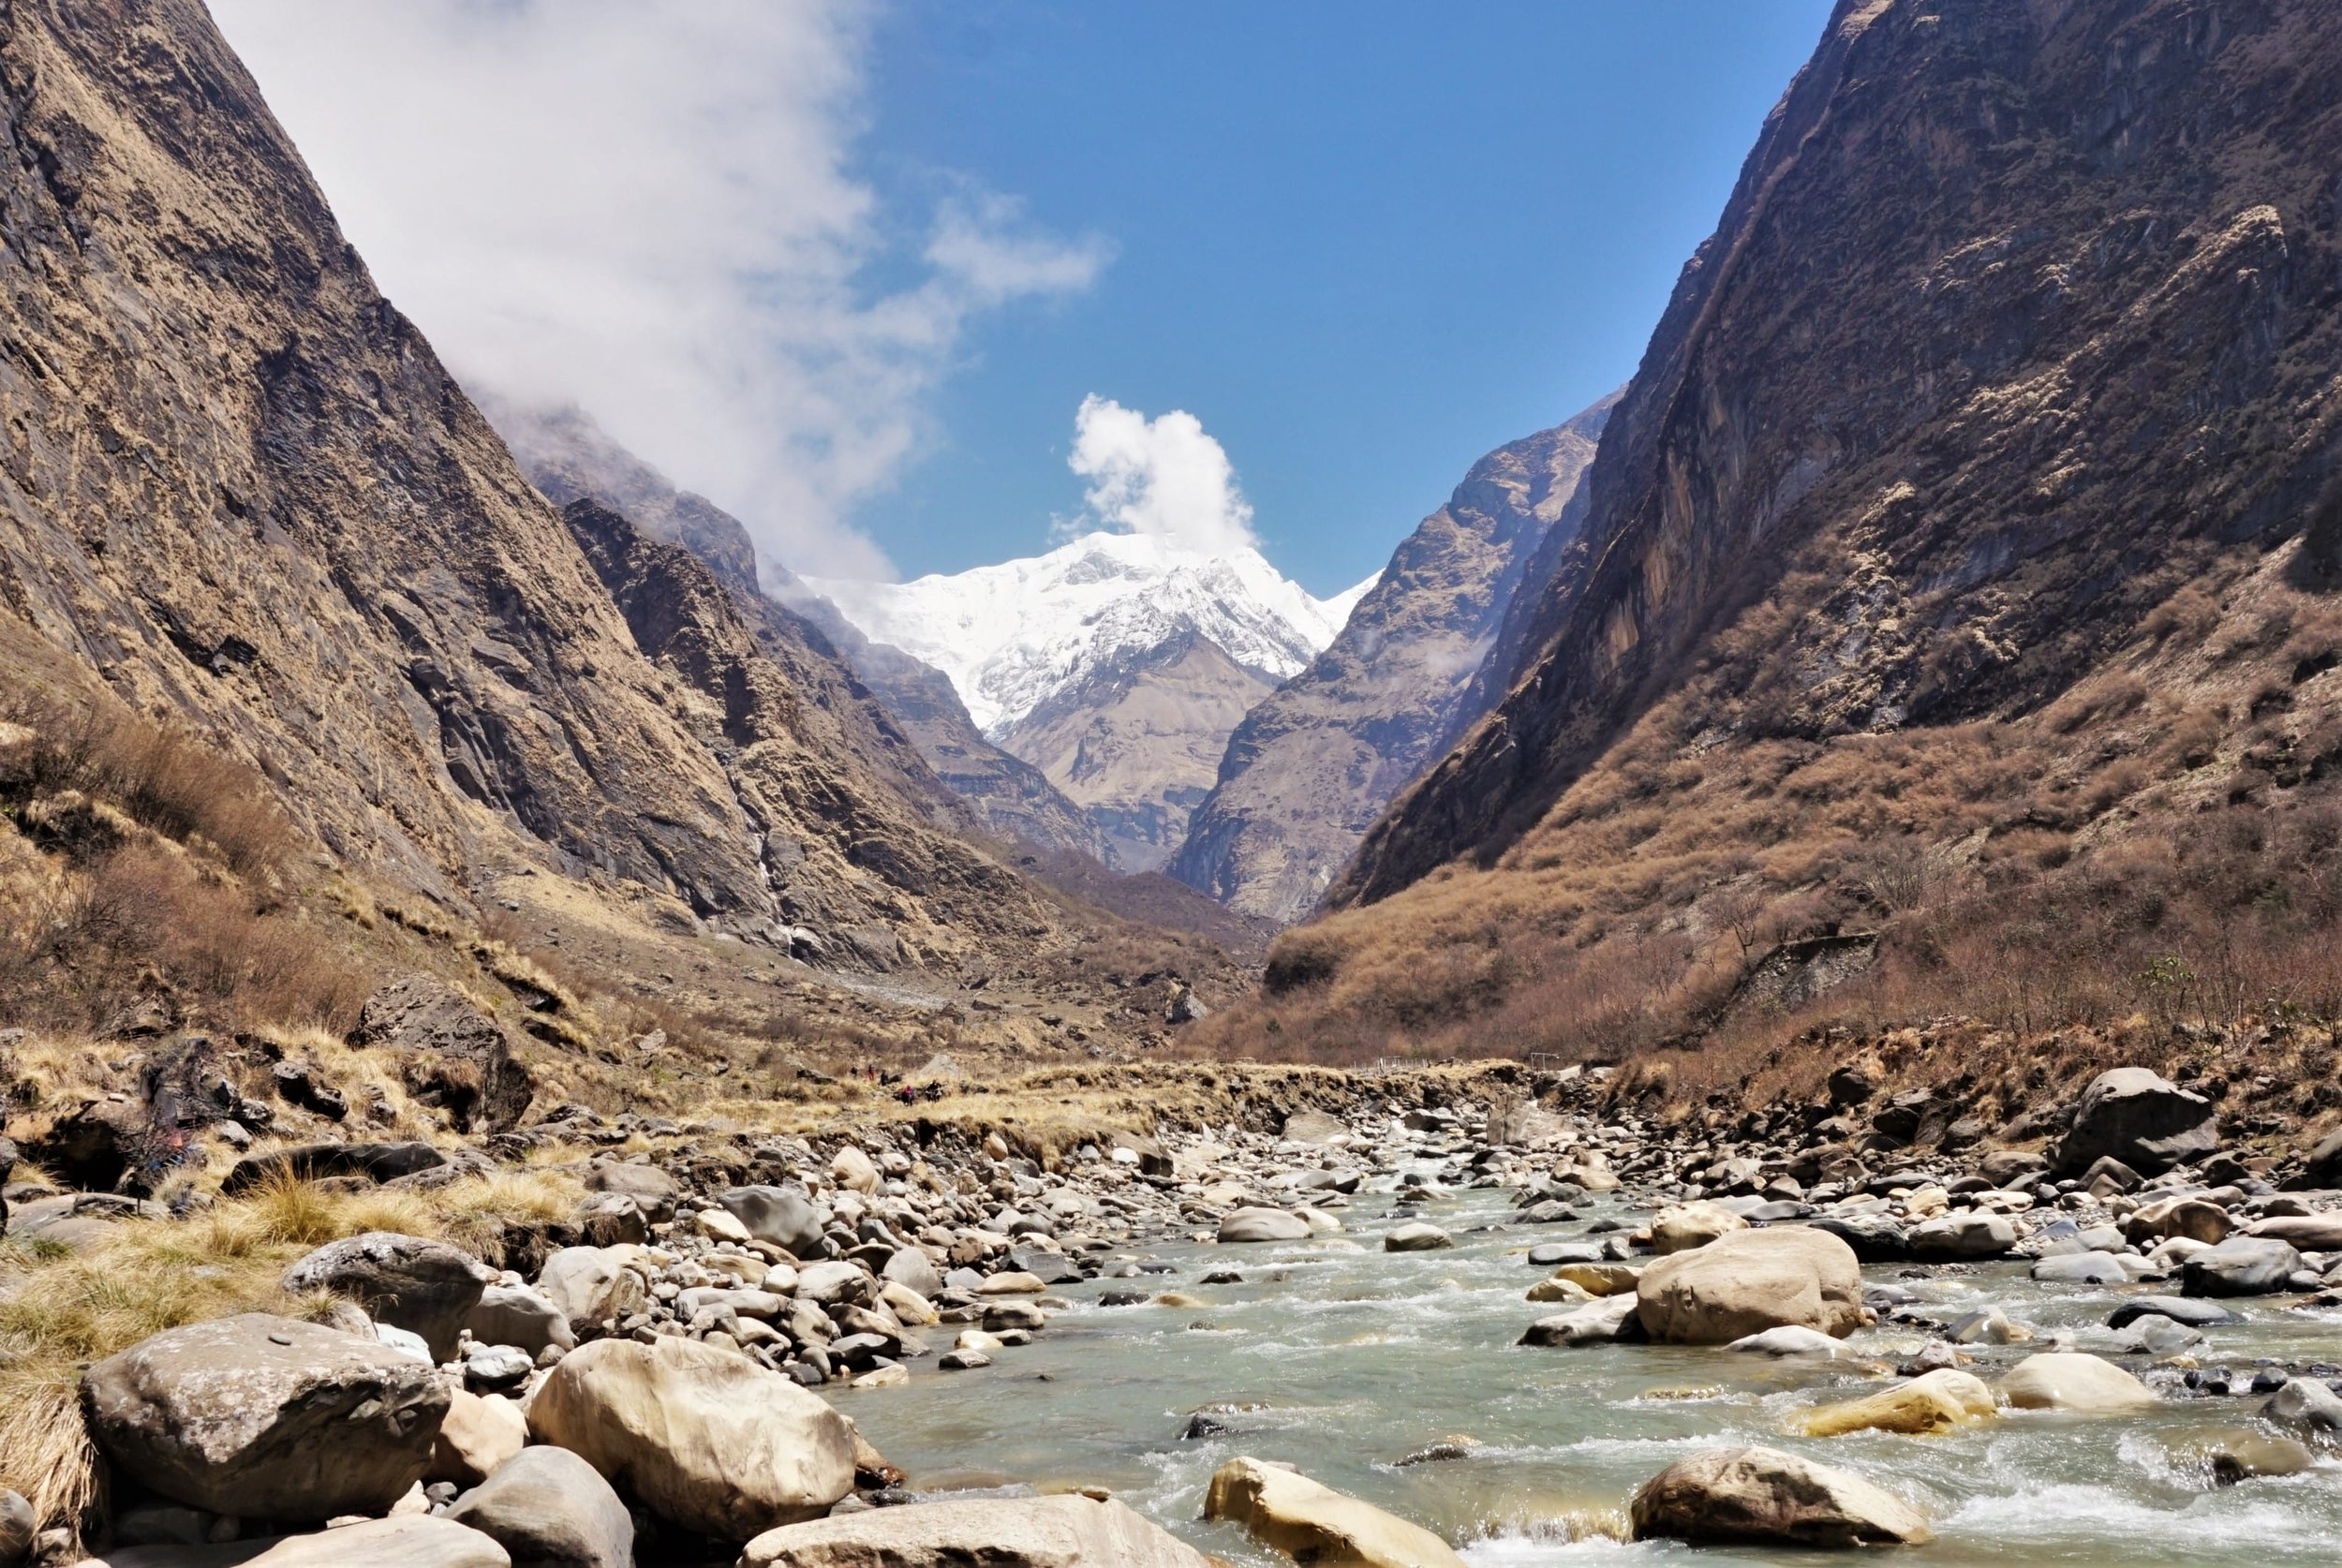 Amazing views up the valley towards the Annapurna peak along the Annapurna Base Camp Trek.